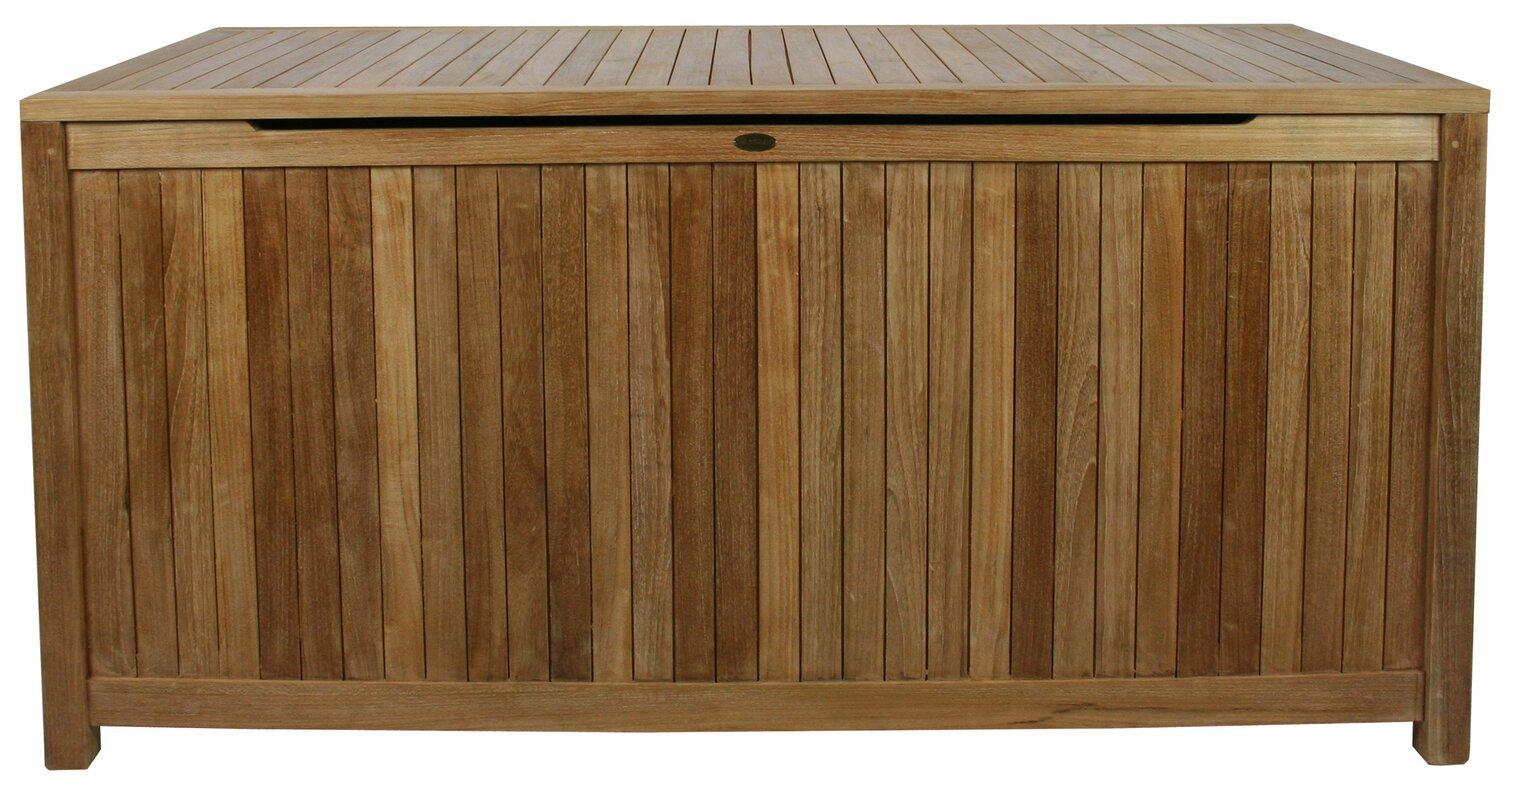 Bay Isle Home Everleigh Teak Deck Box